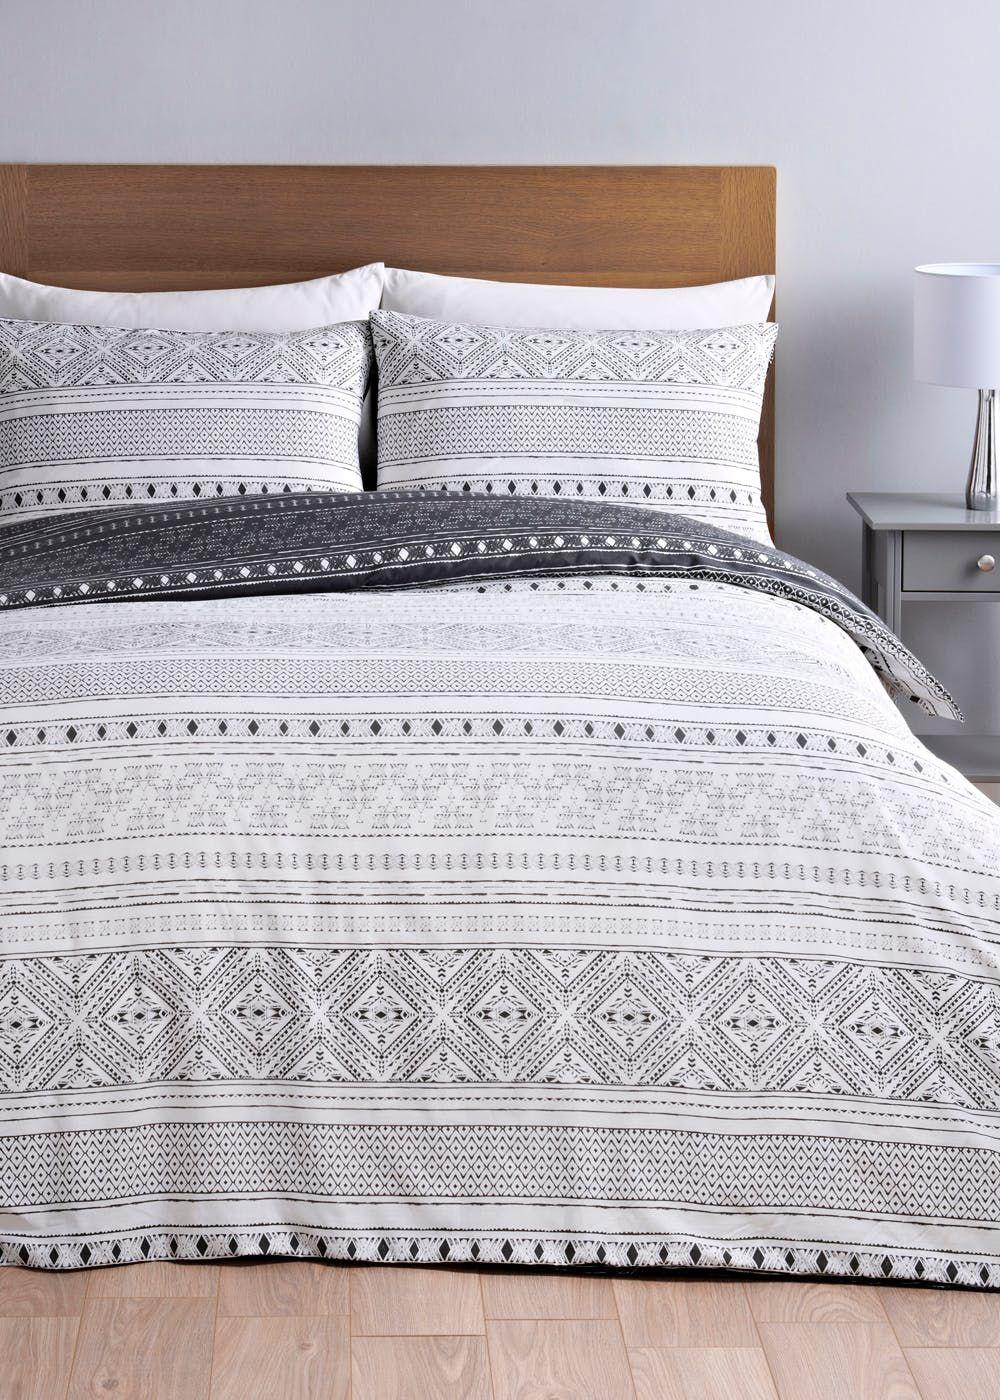 Aztec Print Duvet Cover Bedding Sets Bed Linen Design Luxury